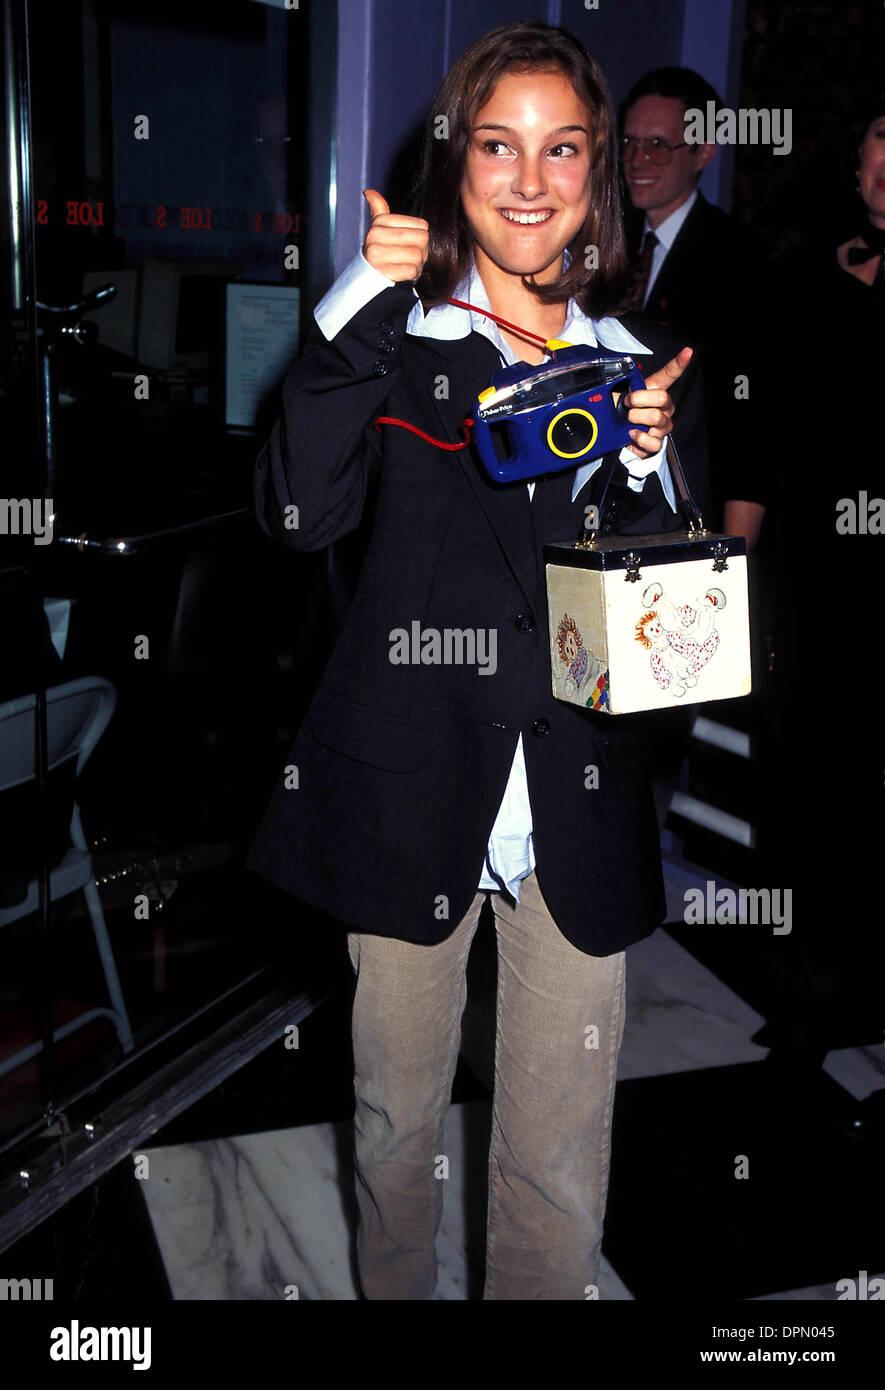 Oct. 6, 2006 - K15382KJ.PREMIERE OF MIGHTY APHRODITE.NATALIE PORTMAN 1995. KELLY JORDAN-  PHOTOS(Credit Image: © Globe Photos/ZUMAPRESS.com) - Stock Image